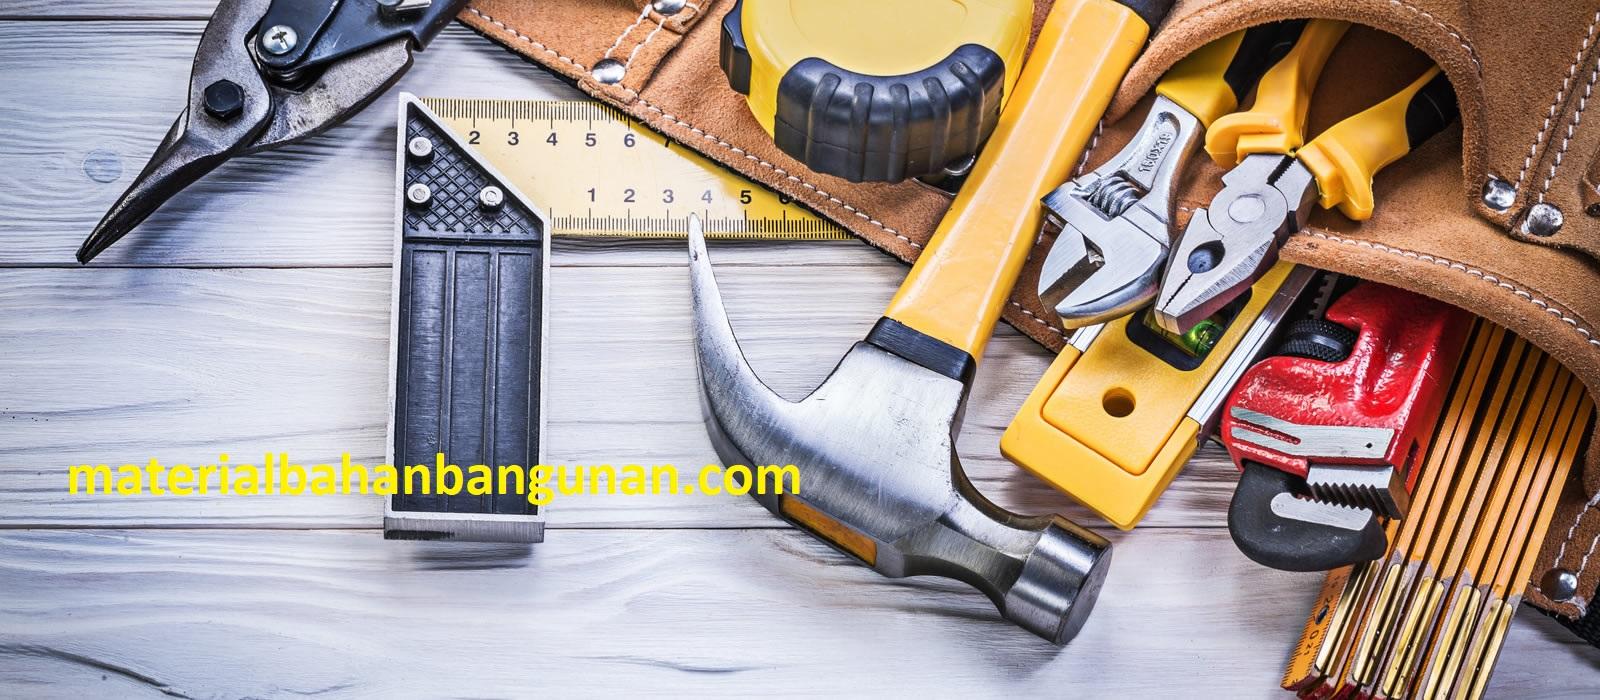 Hand Tools Alat Alat Teknik Toko Bangunan Depok Alat Teknik Alat Safety Dan Sambungan Air Jenis barang toko bangunan